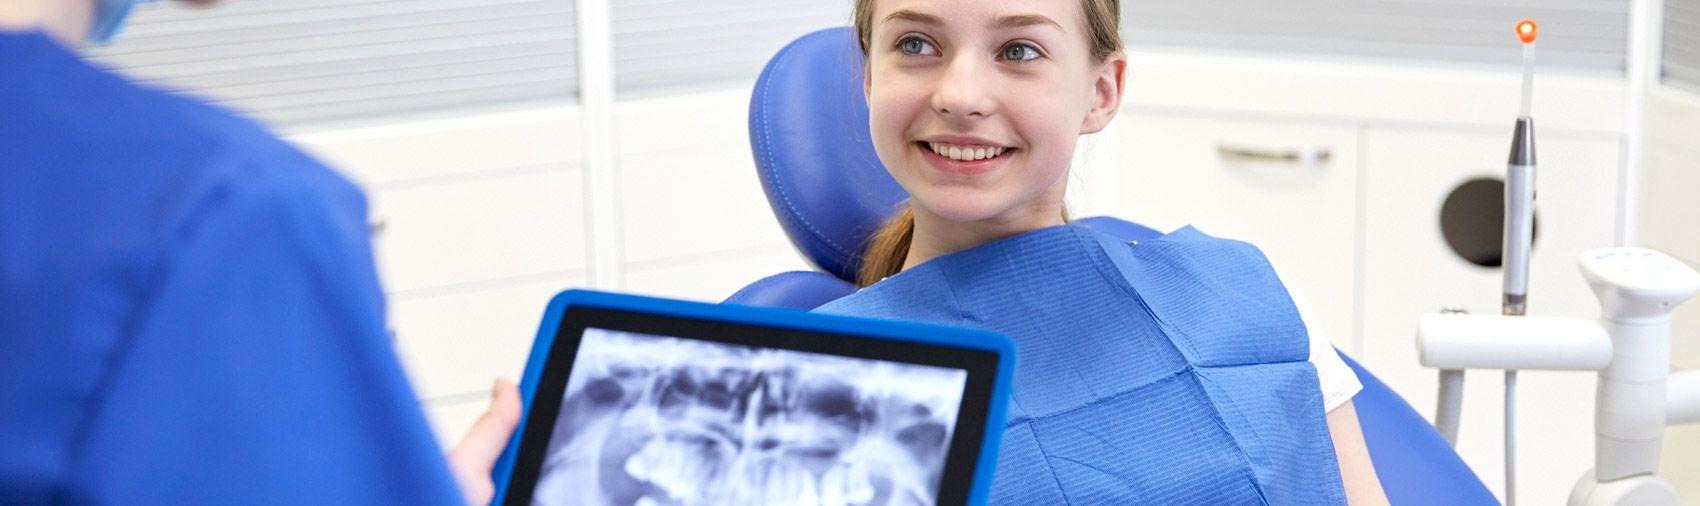 Dental X-Rays - Meredith Levine, DDS, Inc.